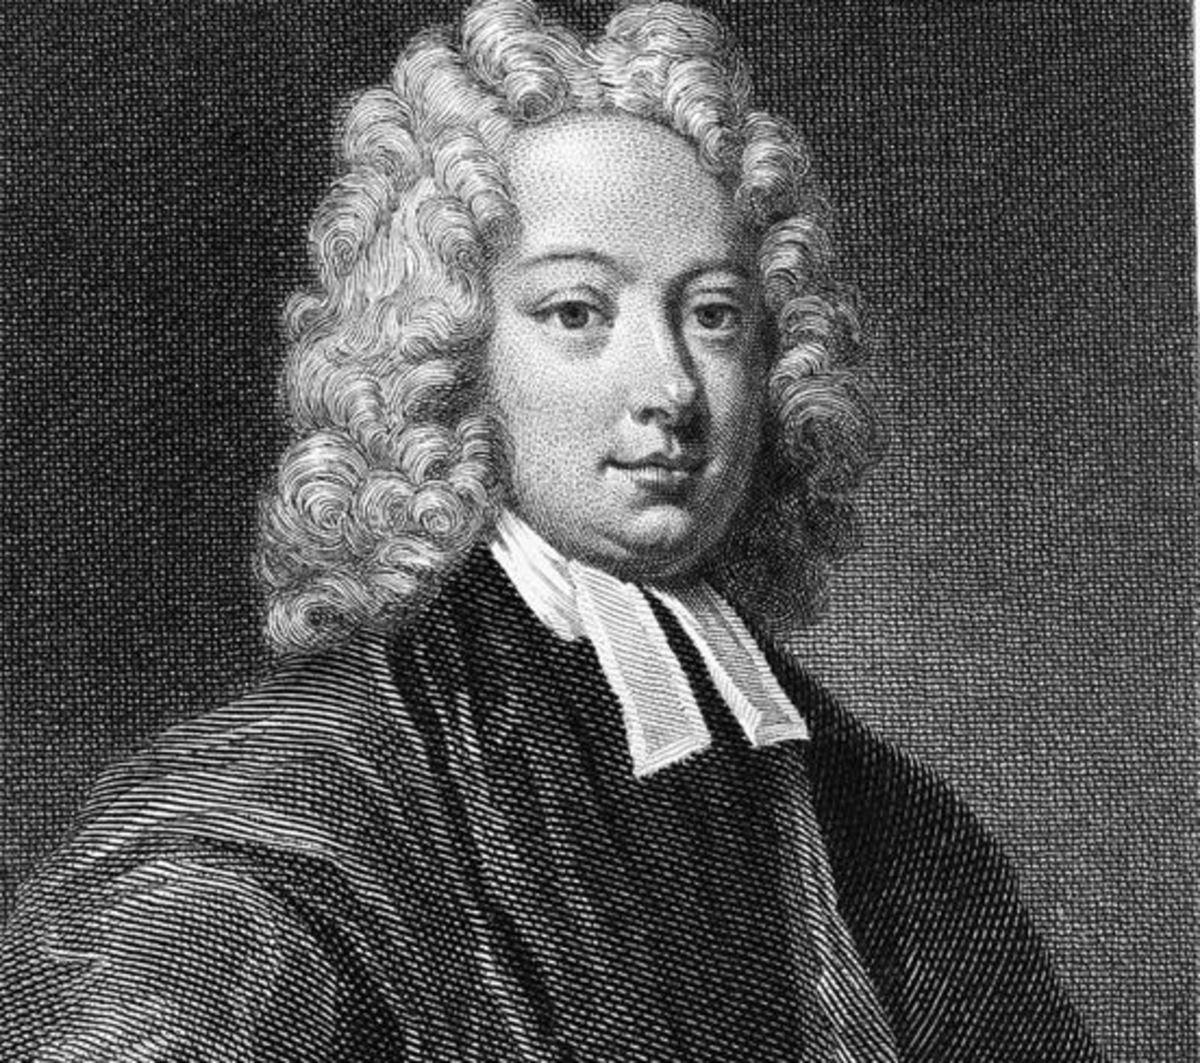 Thomas Parnell (1679-1718)